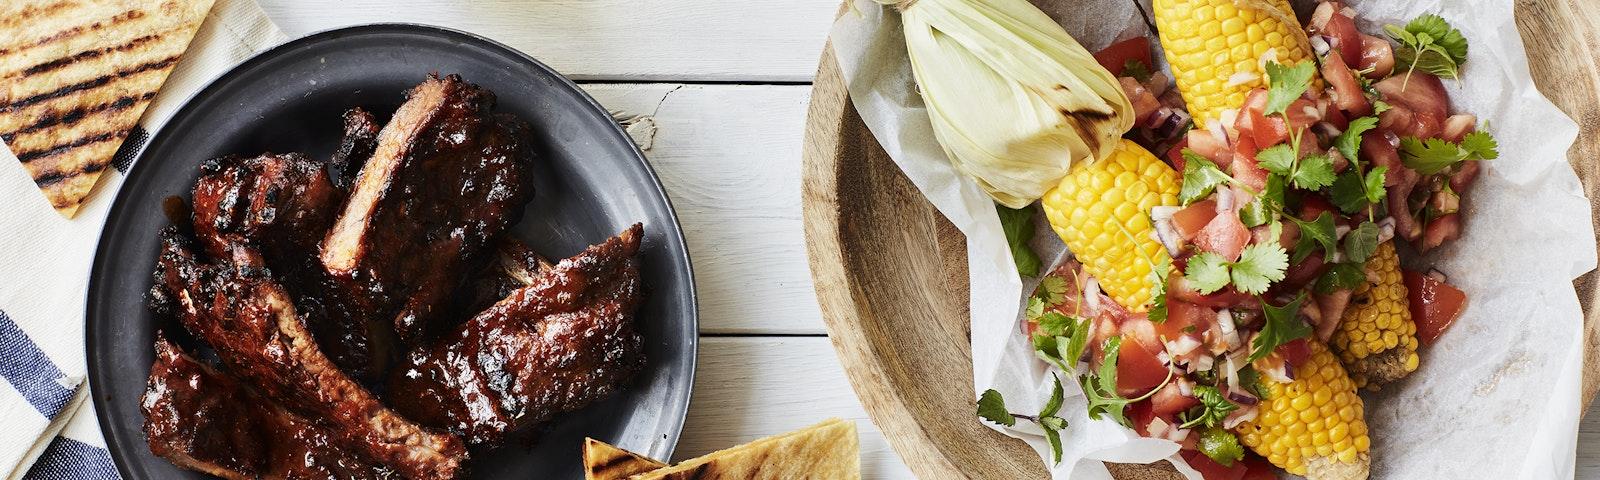 Mexicanske spareribs med grillet majs & tomatsalsa